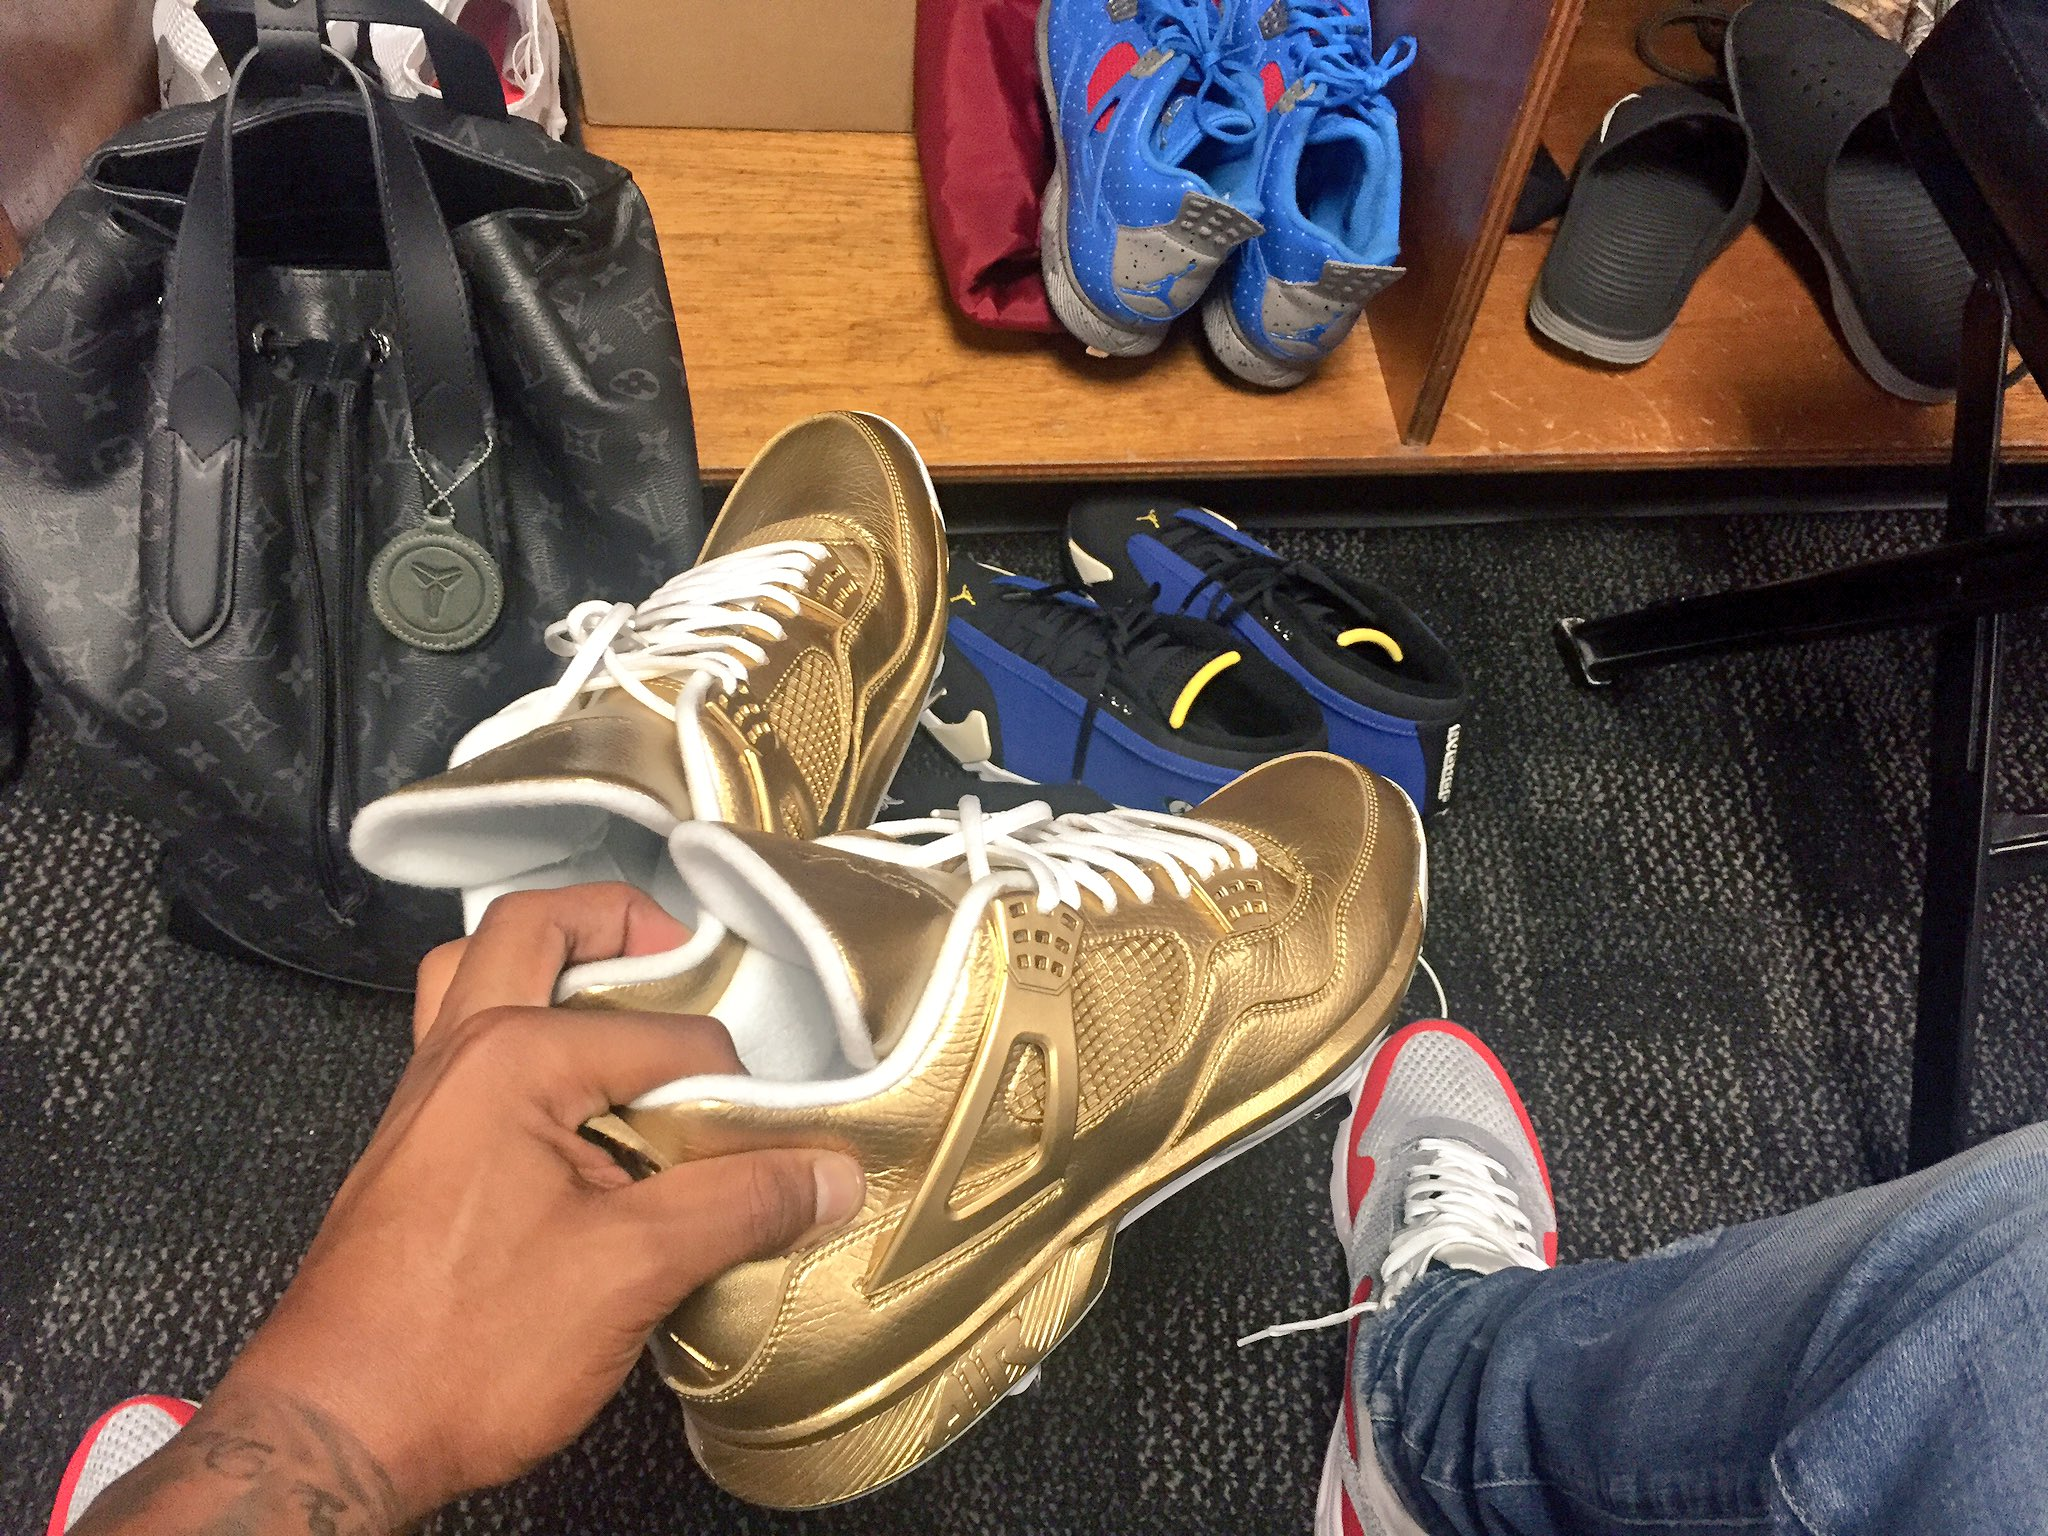 f4ebae925928 ... factory sneaker d259b 9b4b2 Image via dexterfowler · Gold Air Jordan 4  Cleats  Gio Gonzalez Is Wearing Unreleased Jordans For Christmas ...